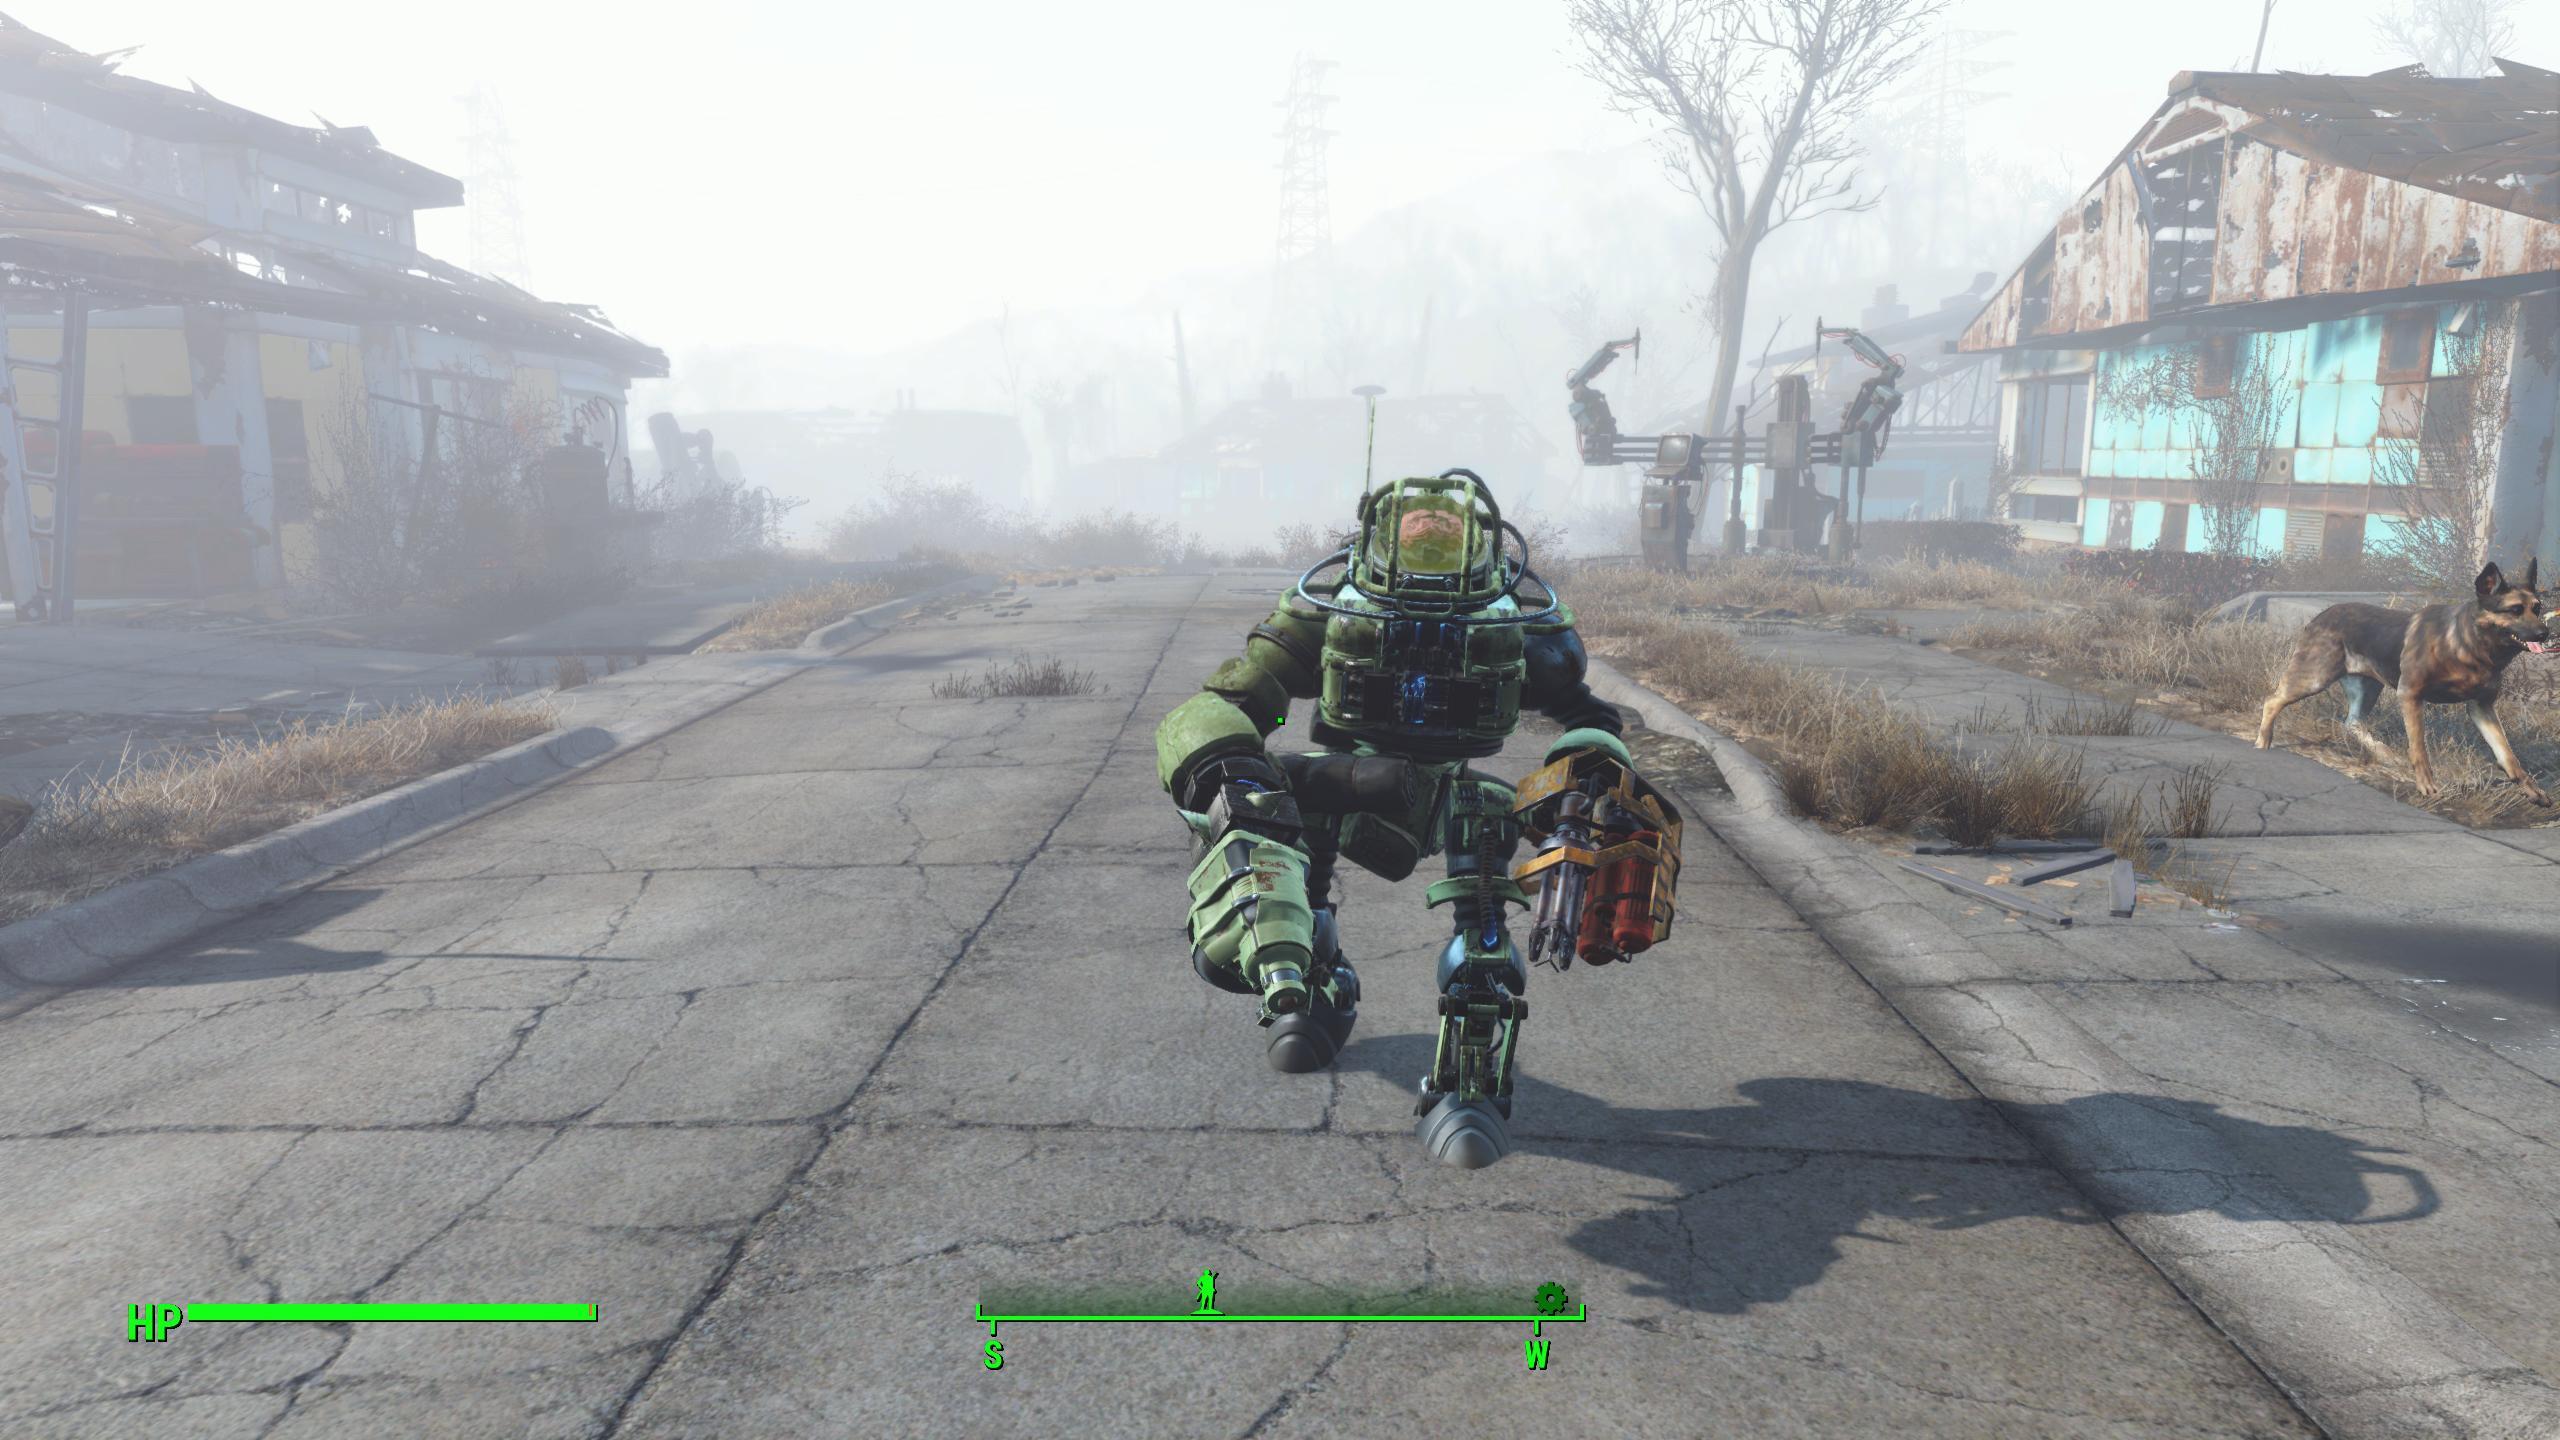 ScreenshotX - Fallout 4 - Automatron DLC